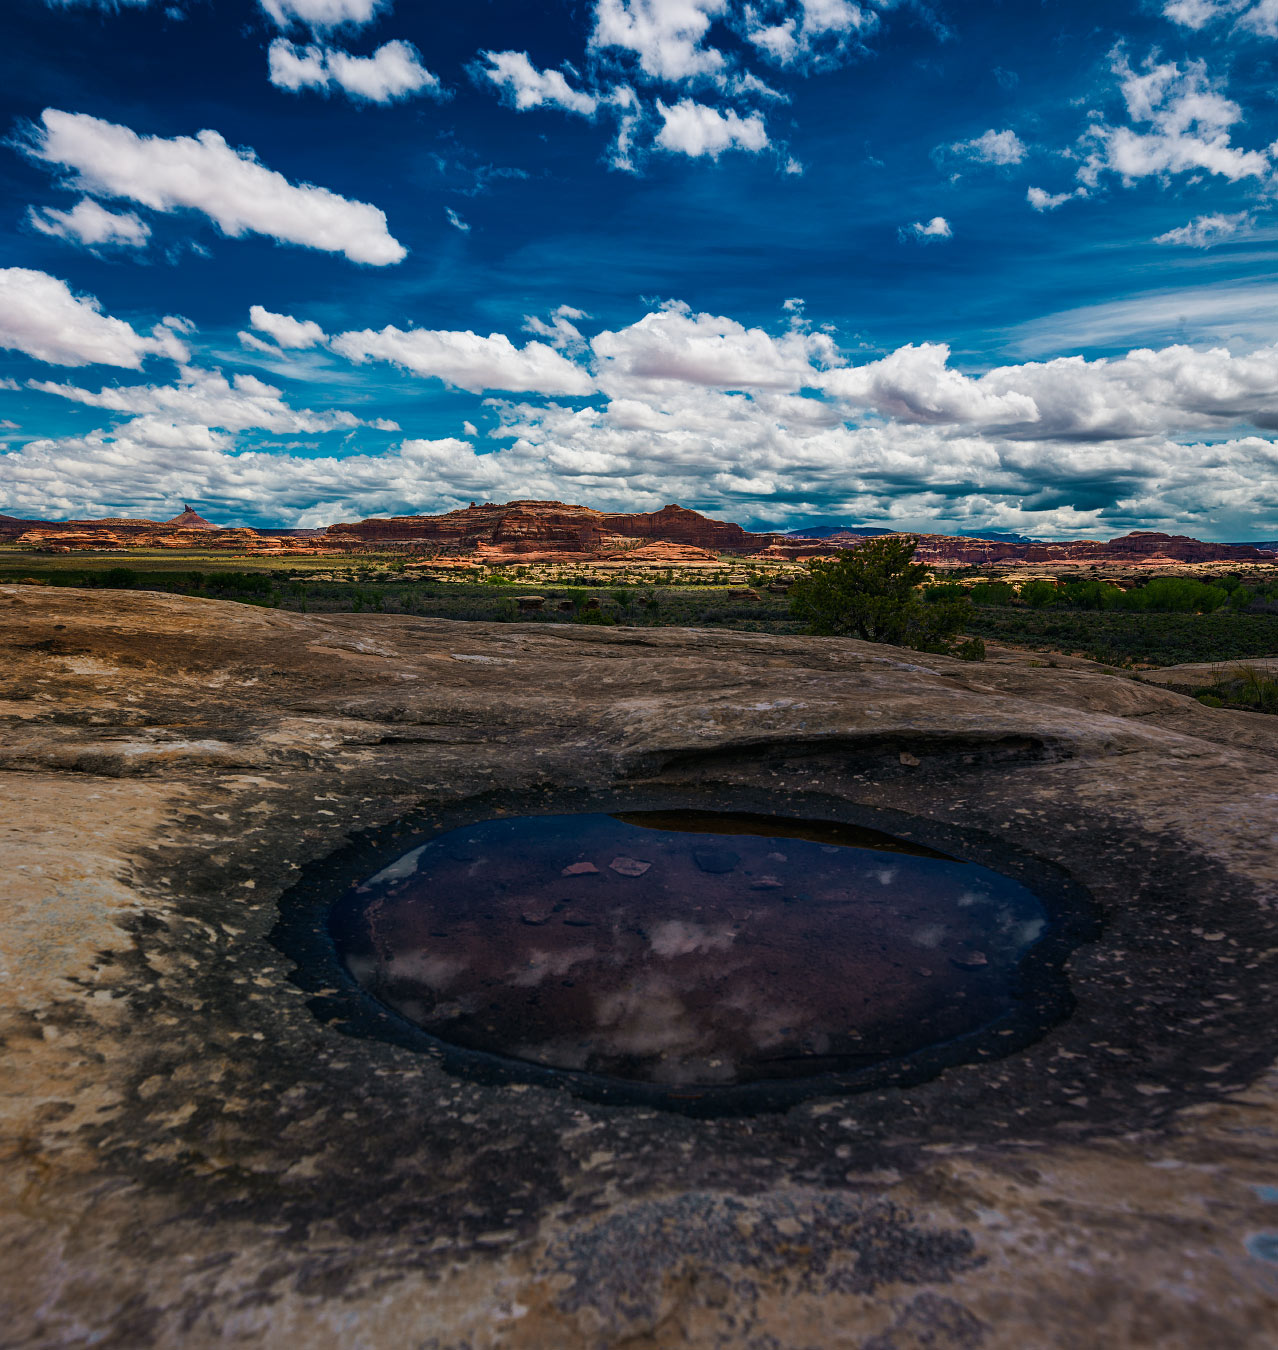 A natural pool after a rainstorm fills a rock crevice at Canyonlands National Park.